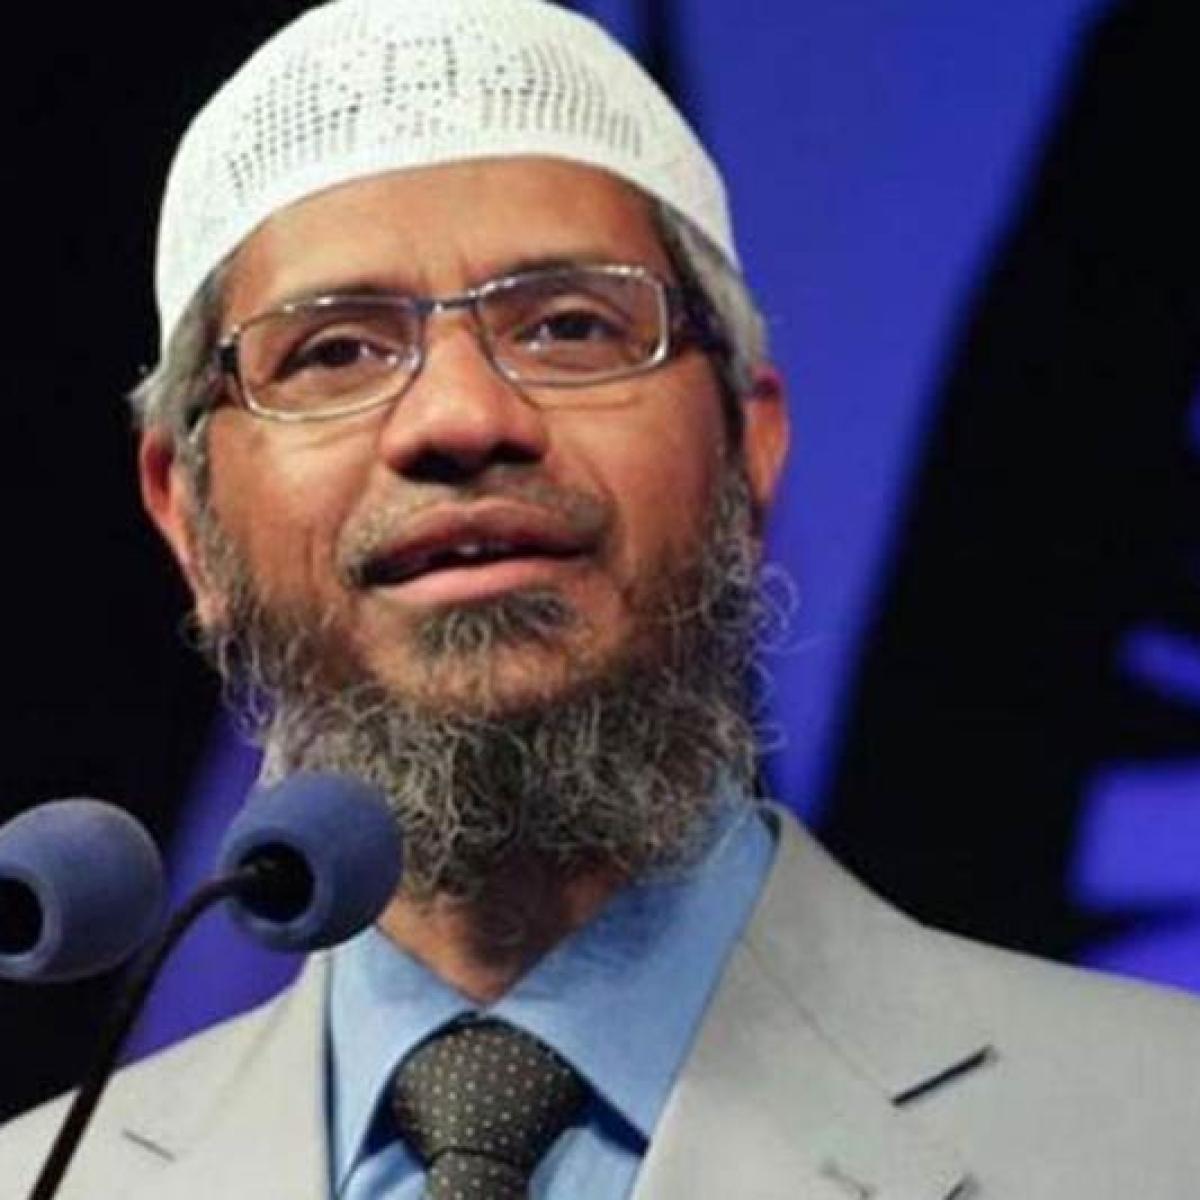 Malaysia may revoke Zakir Naik status for racist remarks